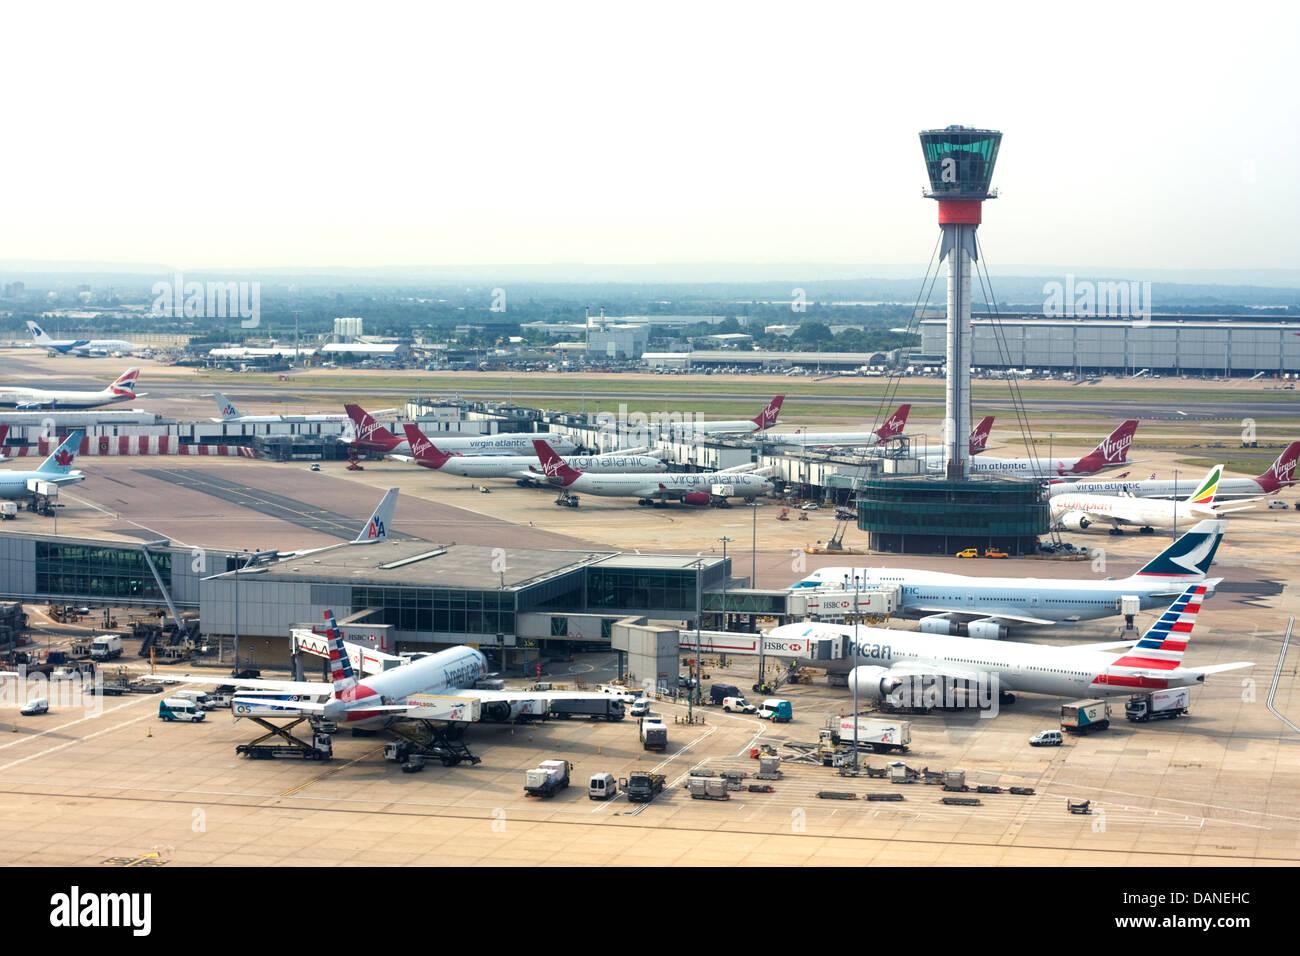 London Heathrow Airport Stock Photo